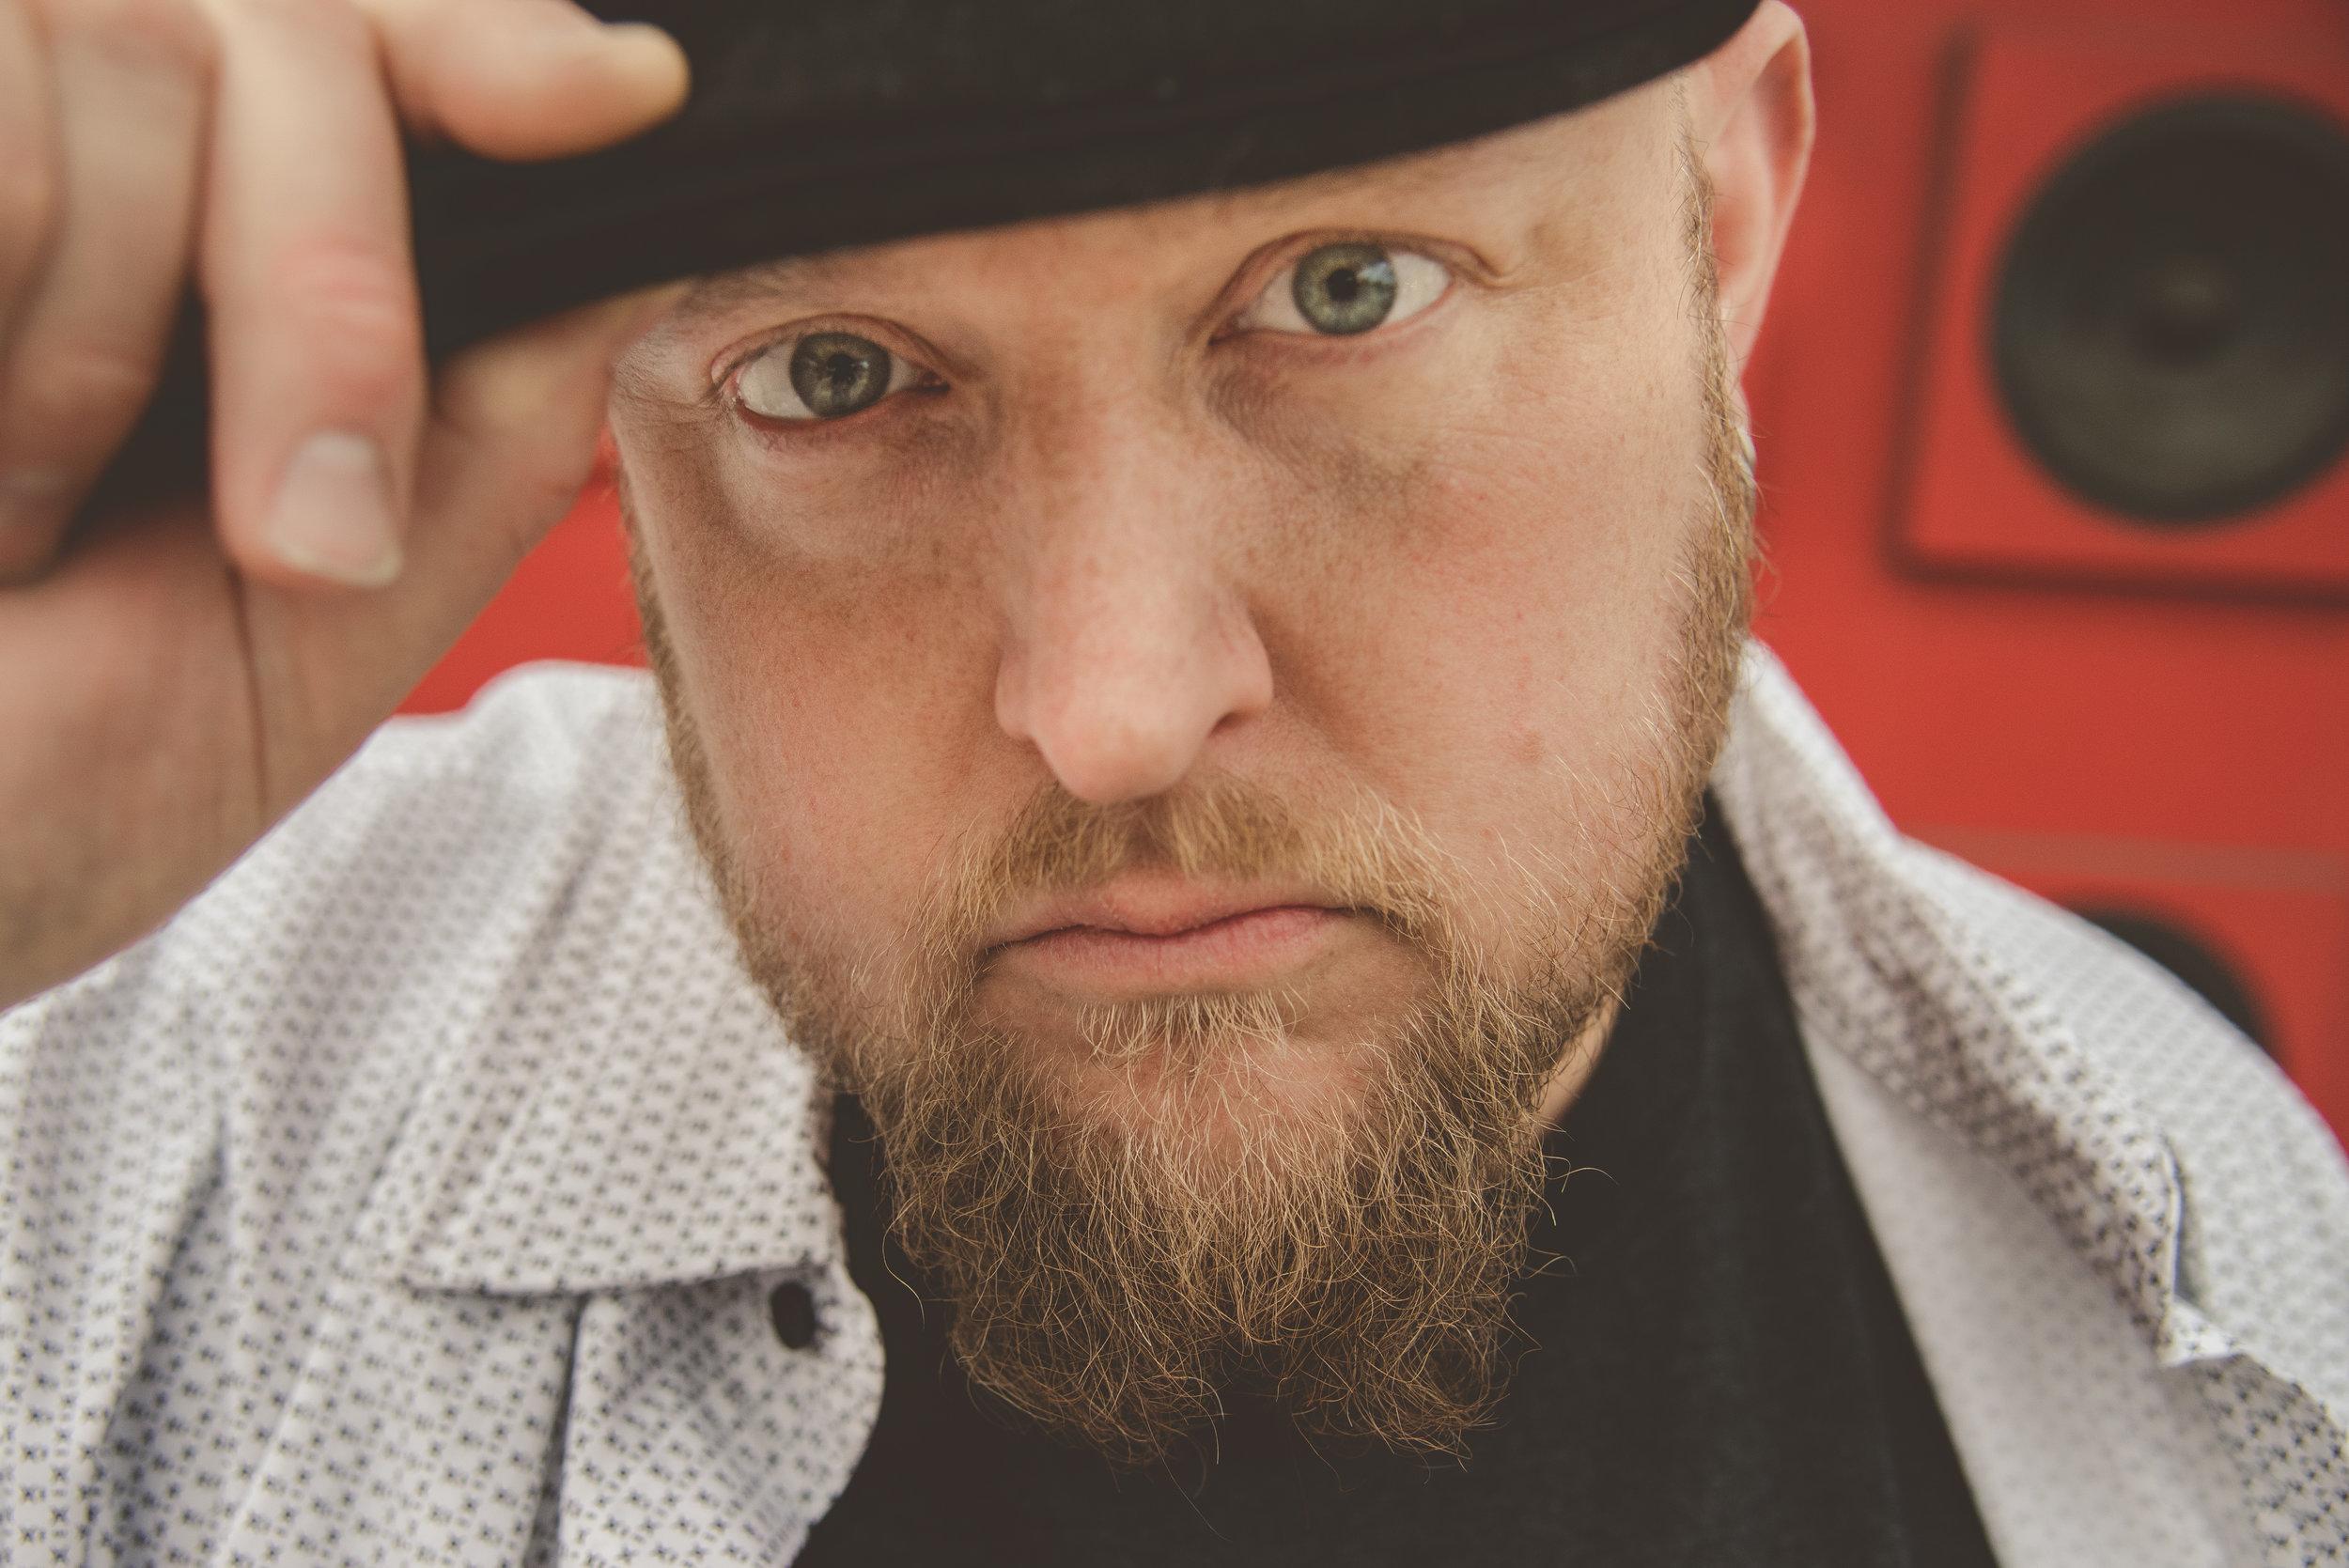 Chris Swan - Inspirational, Piano-driven Hip-hop